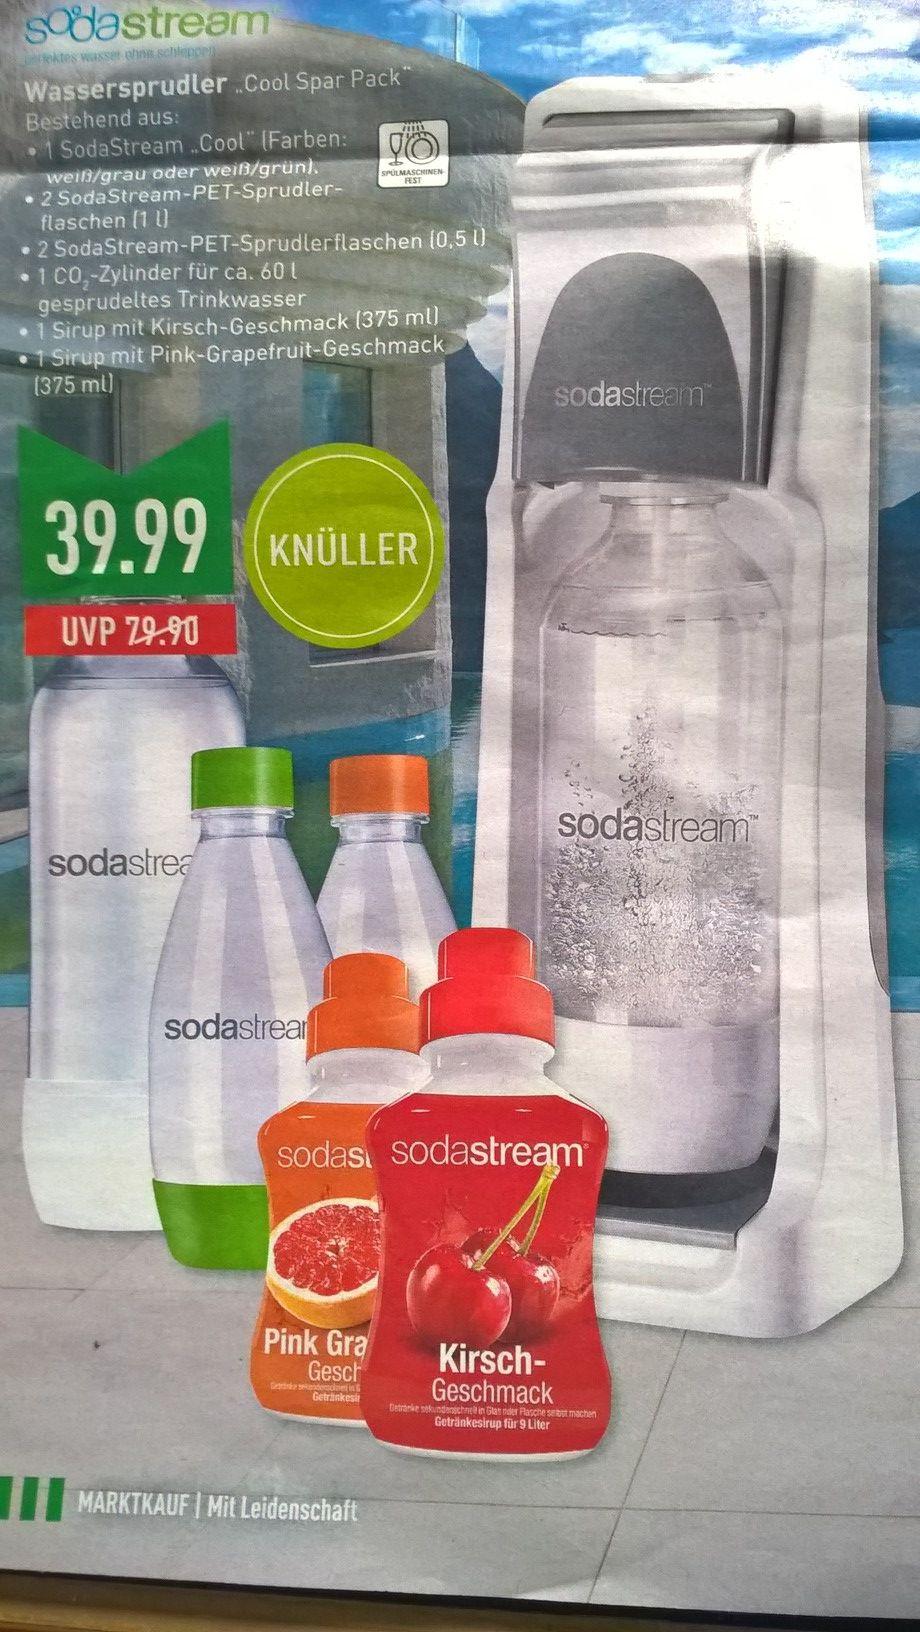 [Marktkauf - lokal NRW - siehe Liste] SodaStream Cool Spar Pack